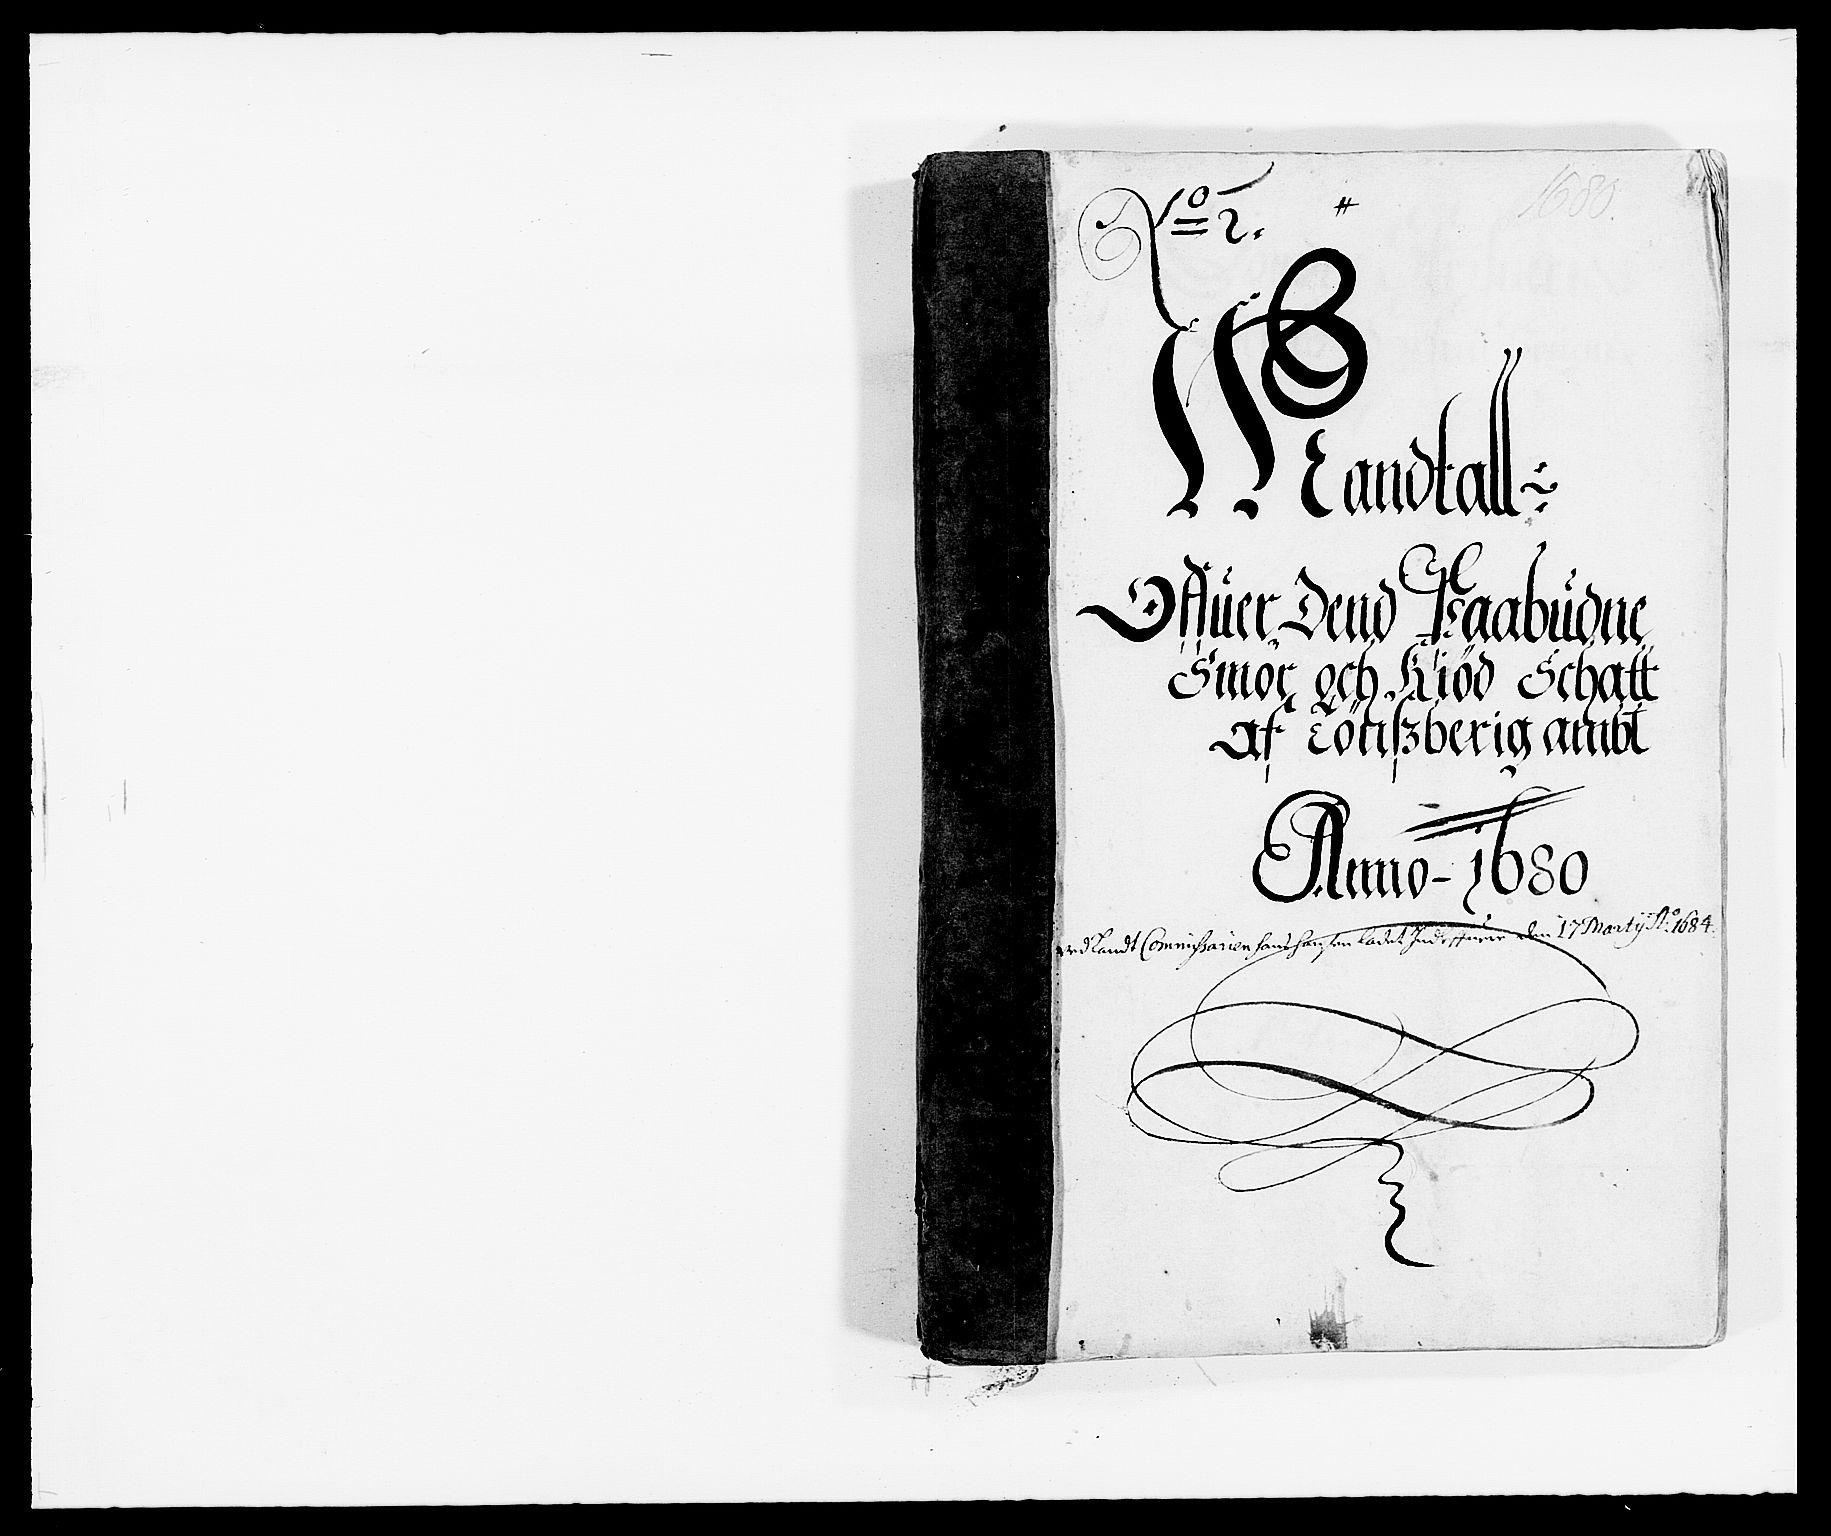 RA, Rentekammeret inntil 1814, Reviderte regnskaper, Fogderegnskap, R32/L1848: Fogderegnskap Jarlsberg grevskap, 1679-1680, s. 112